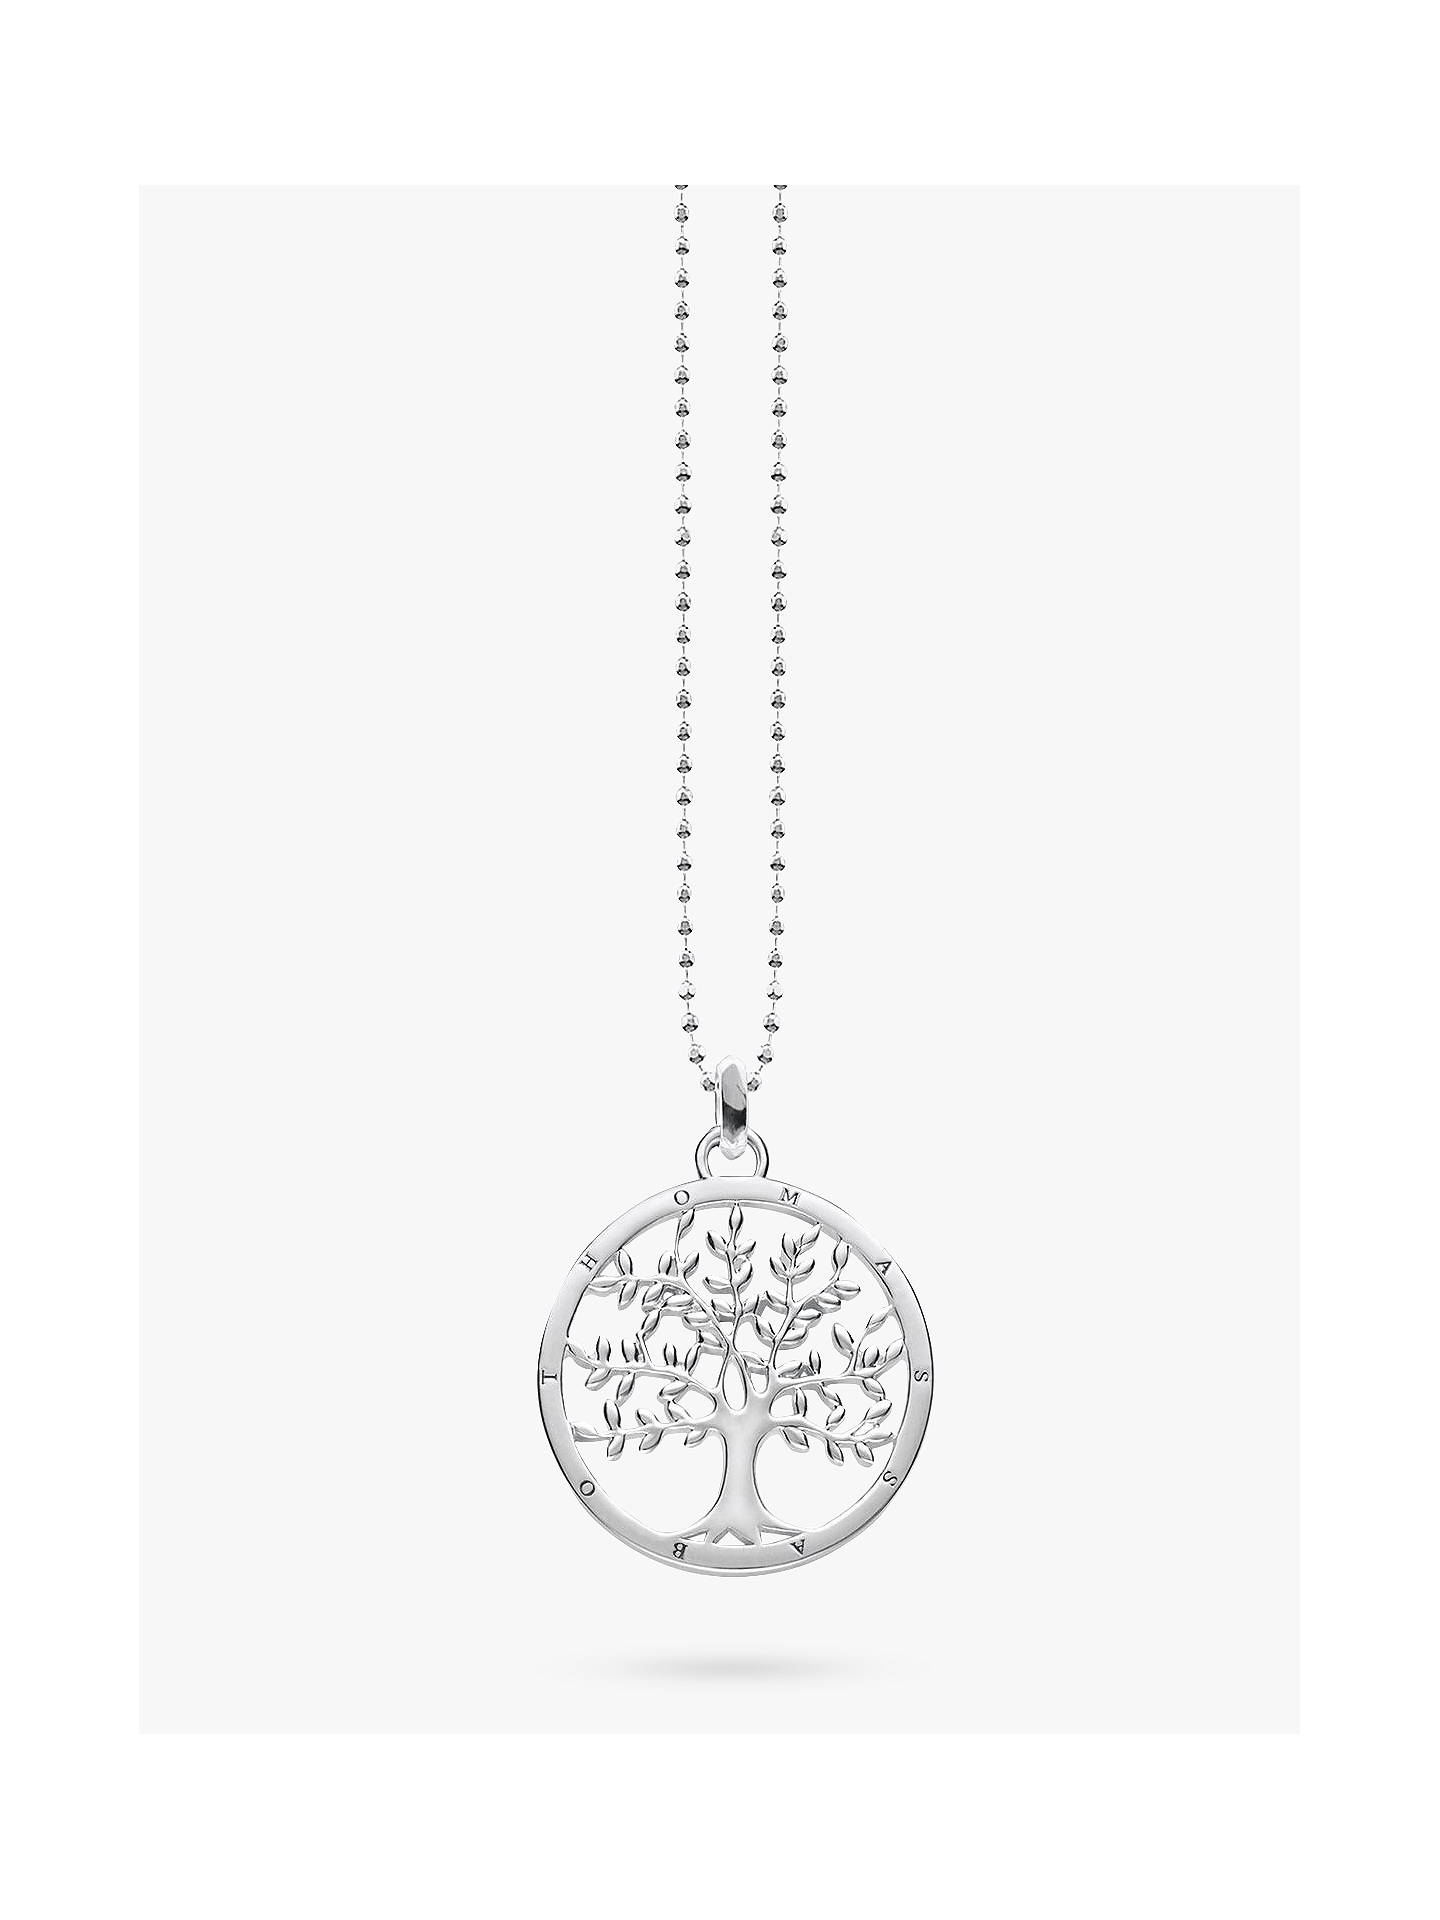 Thomas sabo glam soul tree of love pendant necklace silver at buythomas sabo glam soul tree of love pendant necklace silver online at johnlewis aloadofball Choice Image